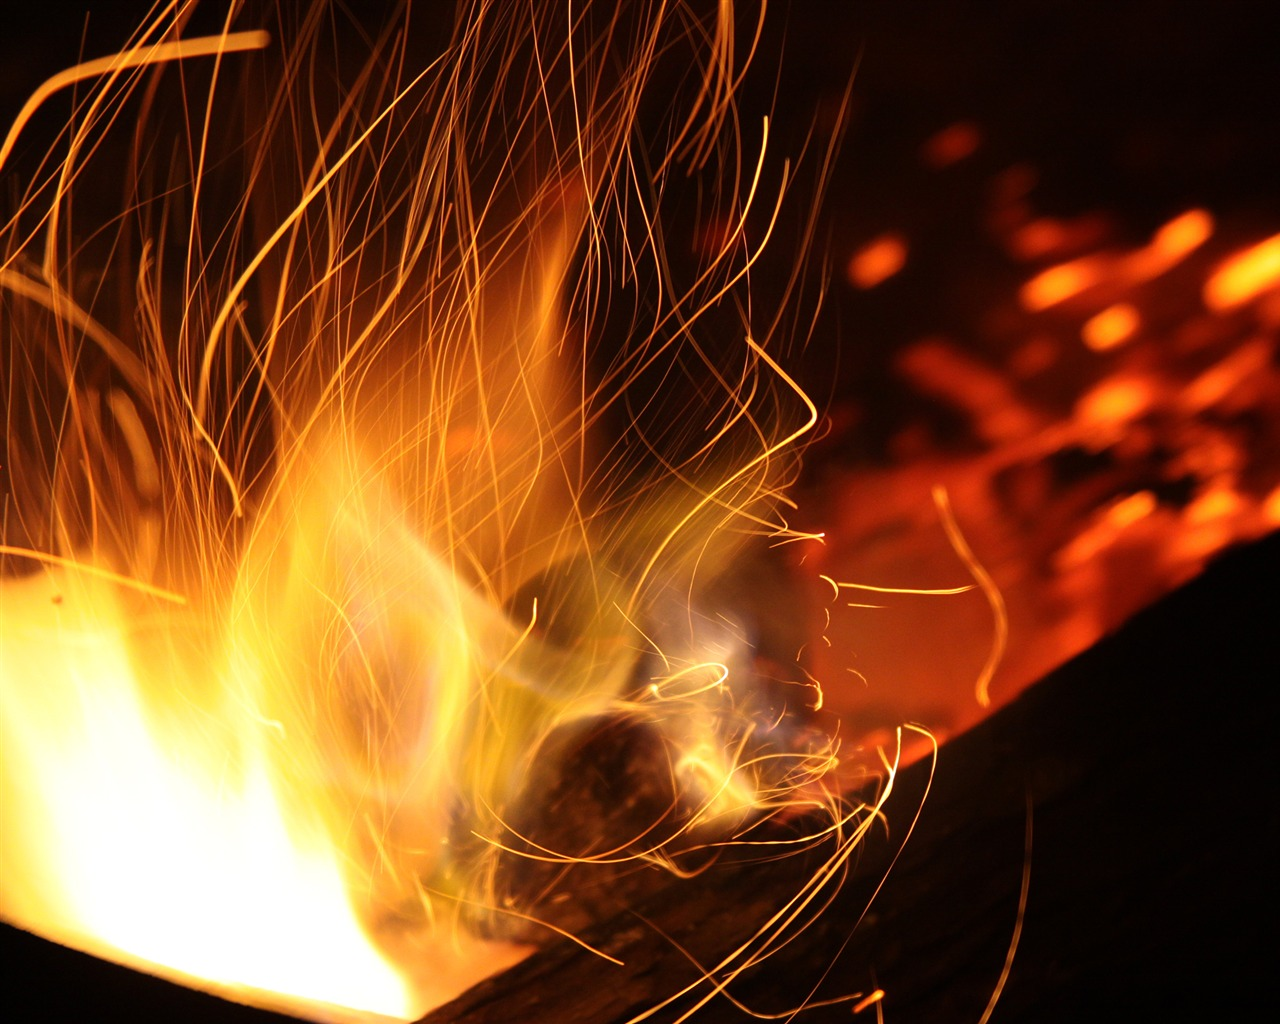 Photography / Burning coal fire close-up-Life Photography HD.